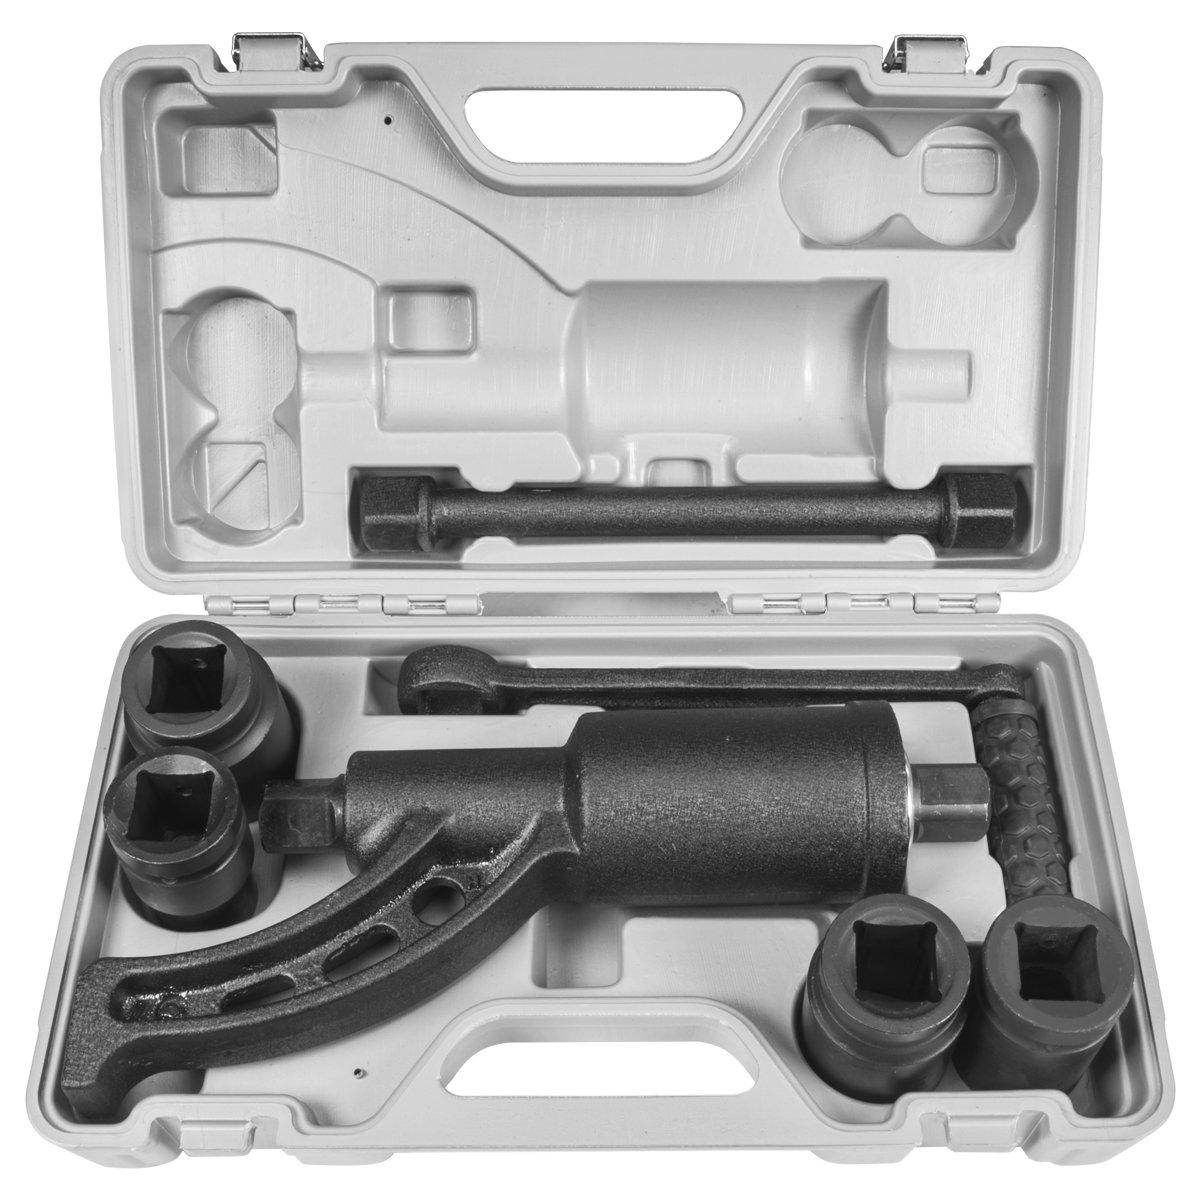 STKUSA Torque Multiplier Labor Saving Lug Nut Wrench W/ 4 Cr-v Socket 5400NM